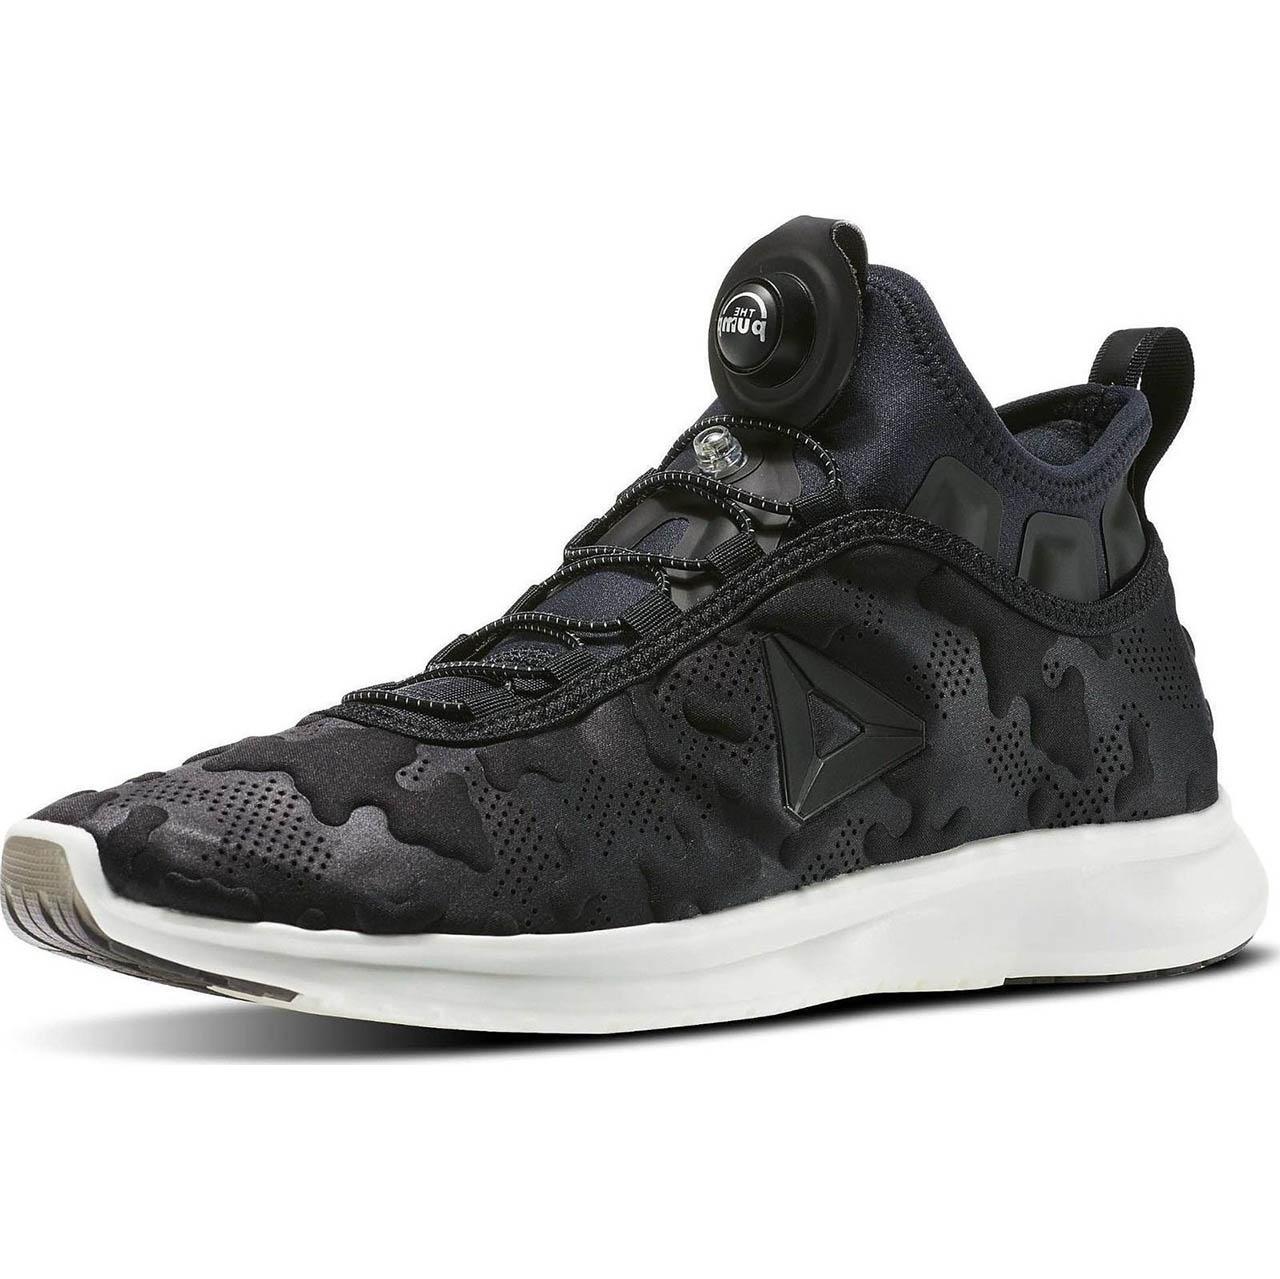 کفش مخصوص دویدن ریباک مدل pump plus nc کد bs8604